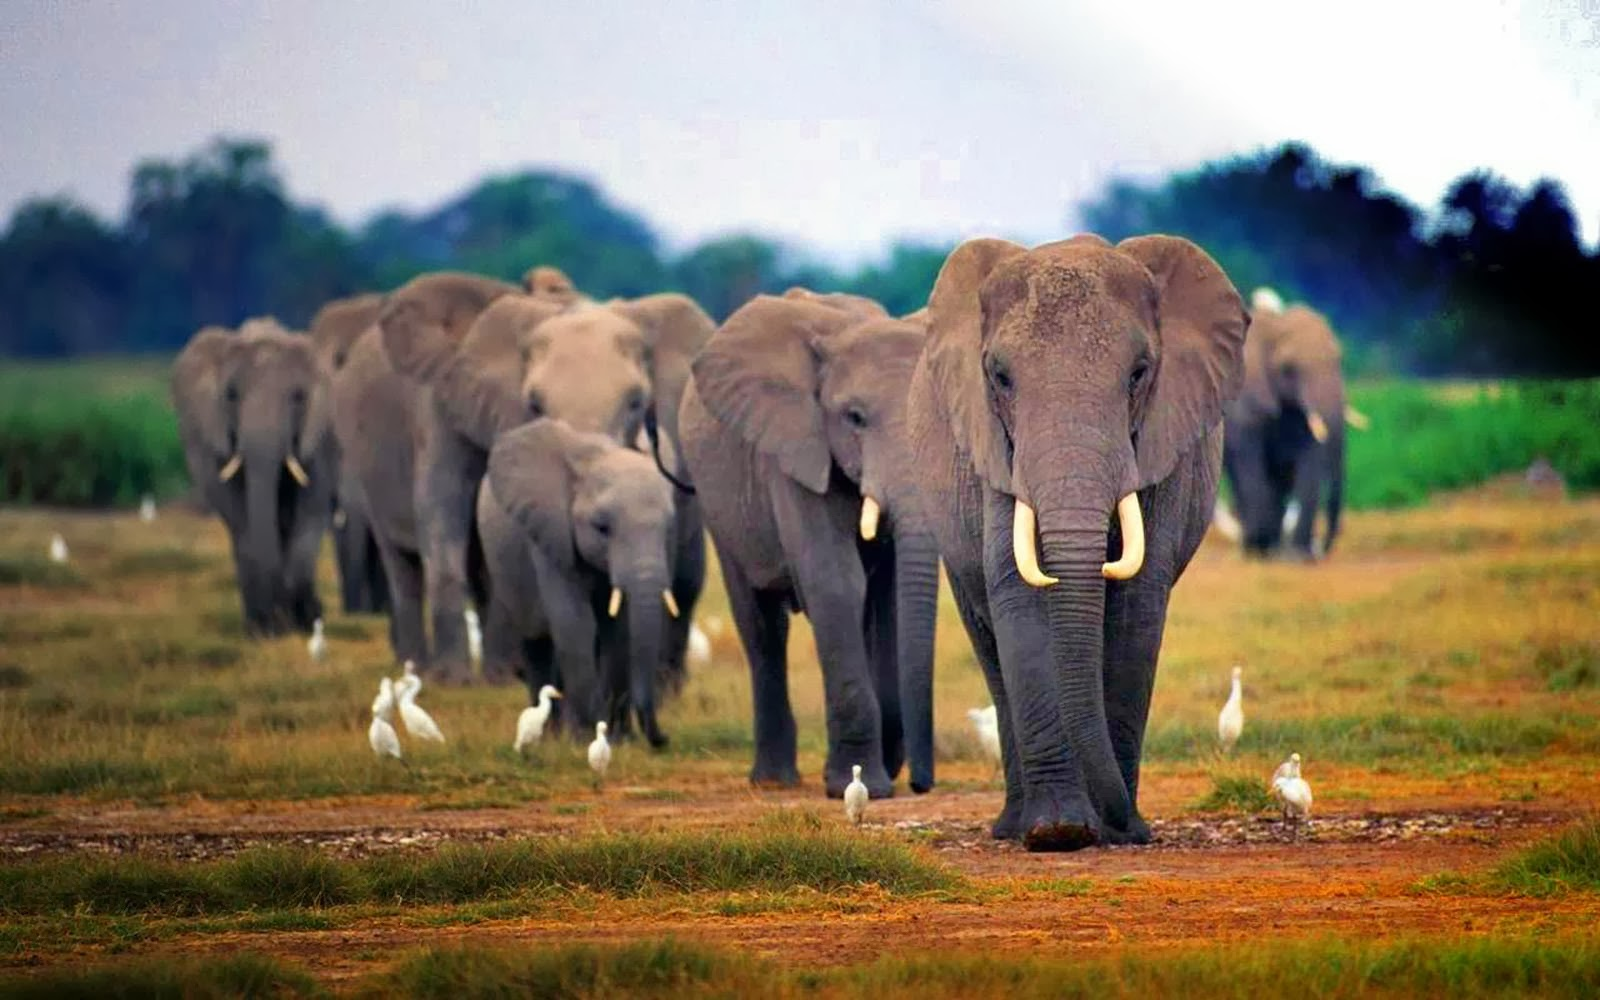 AFRICAN ELEPHANTS HD WALLPAPERS | FREE HD WALLPAPERS